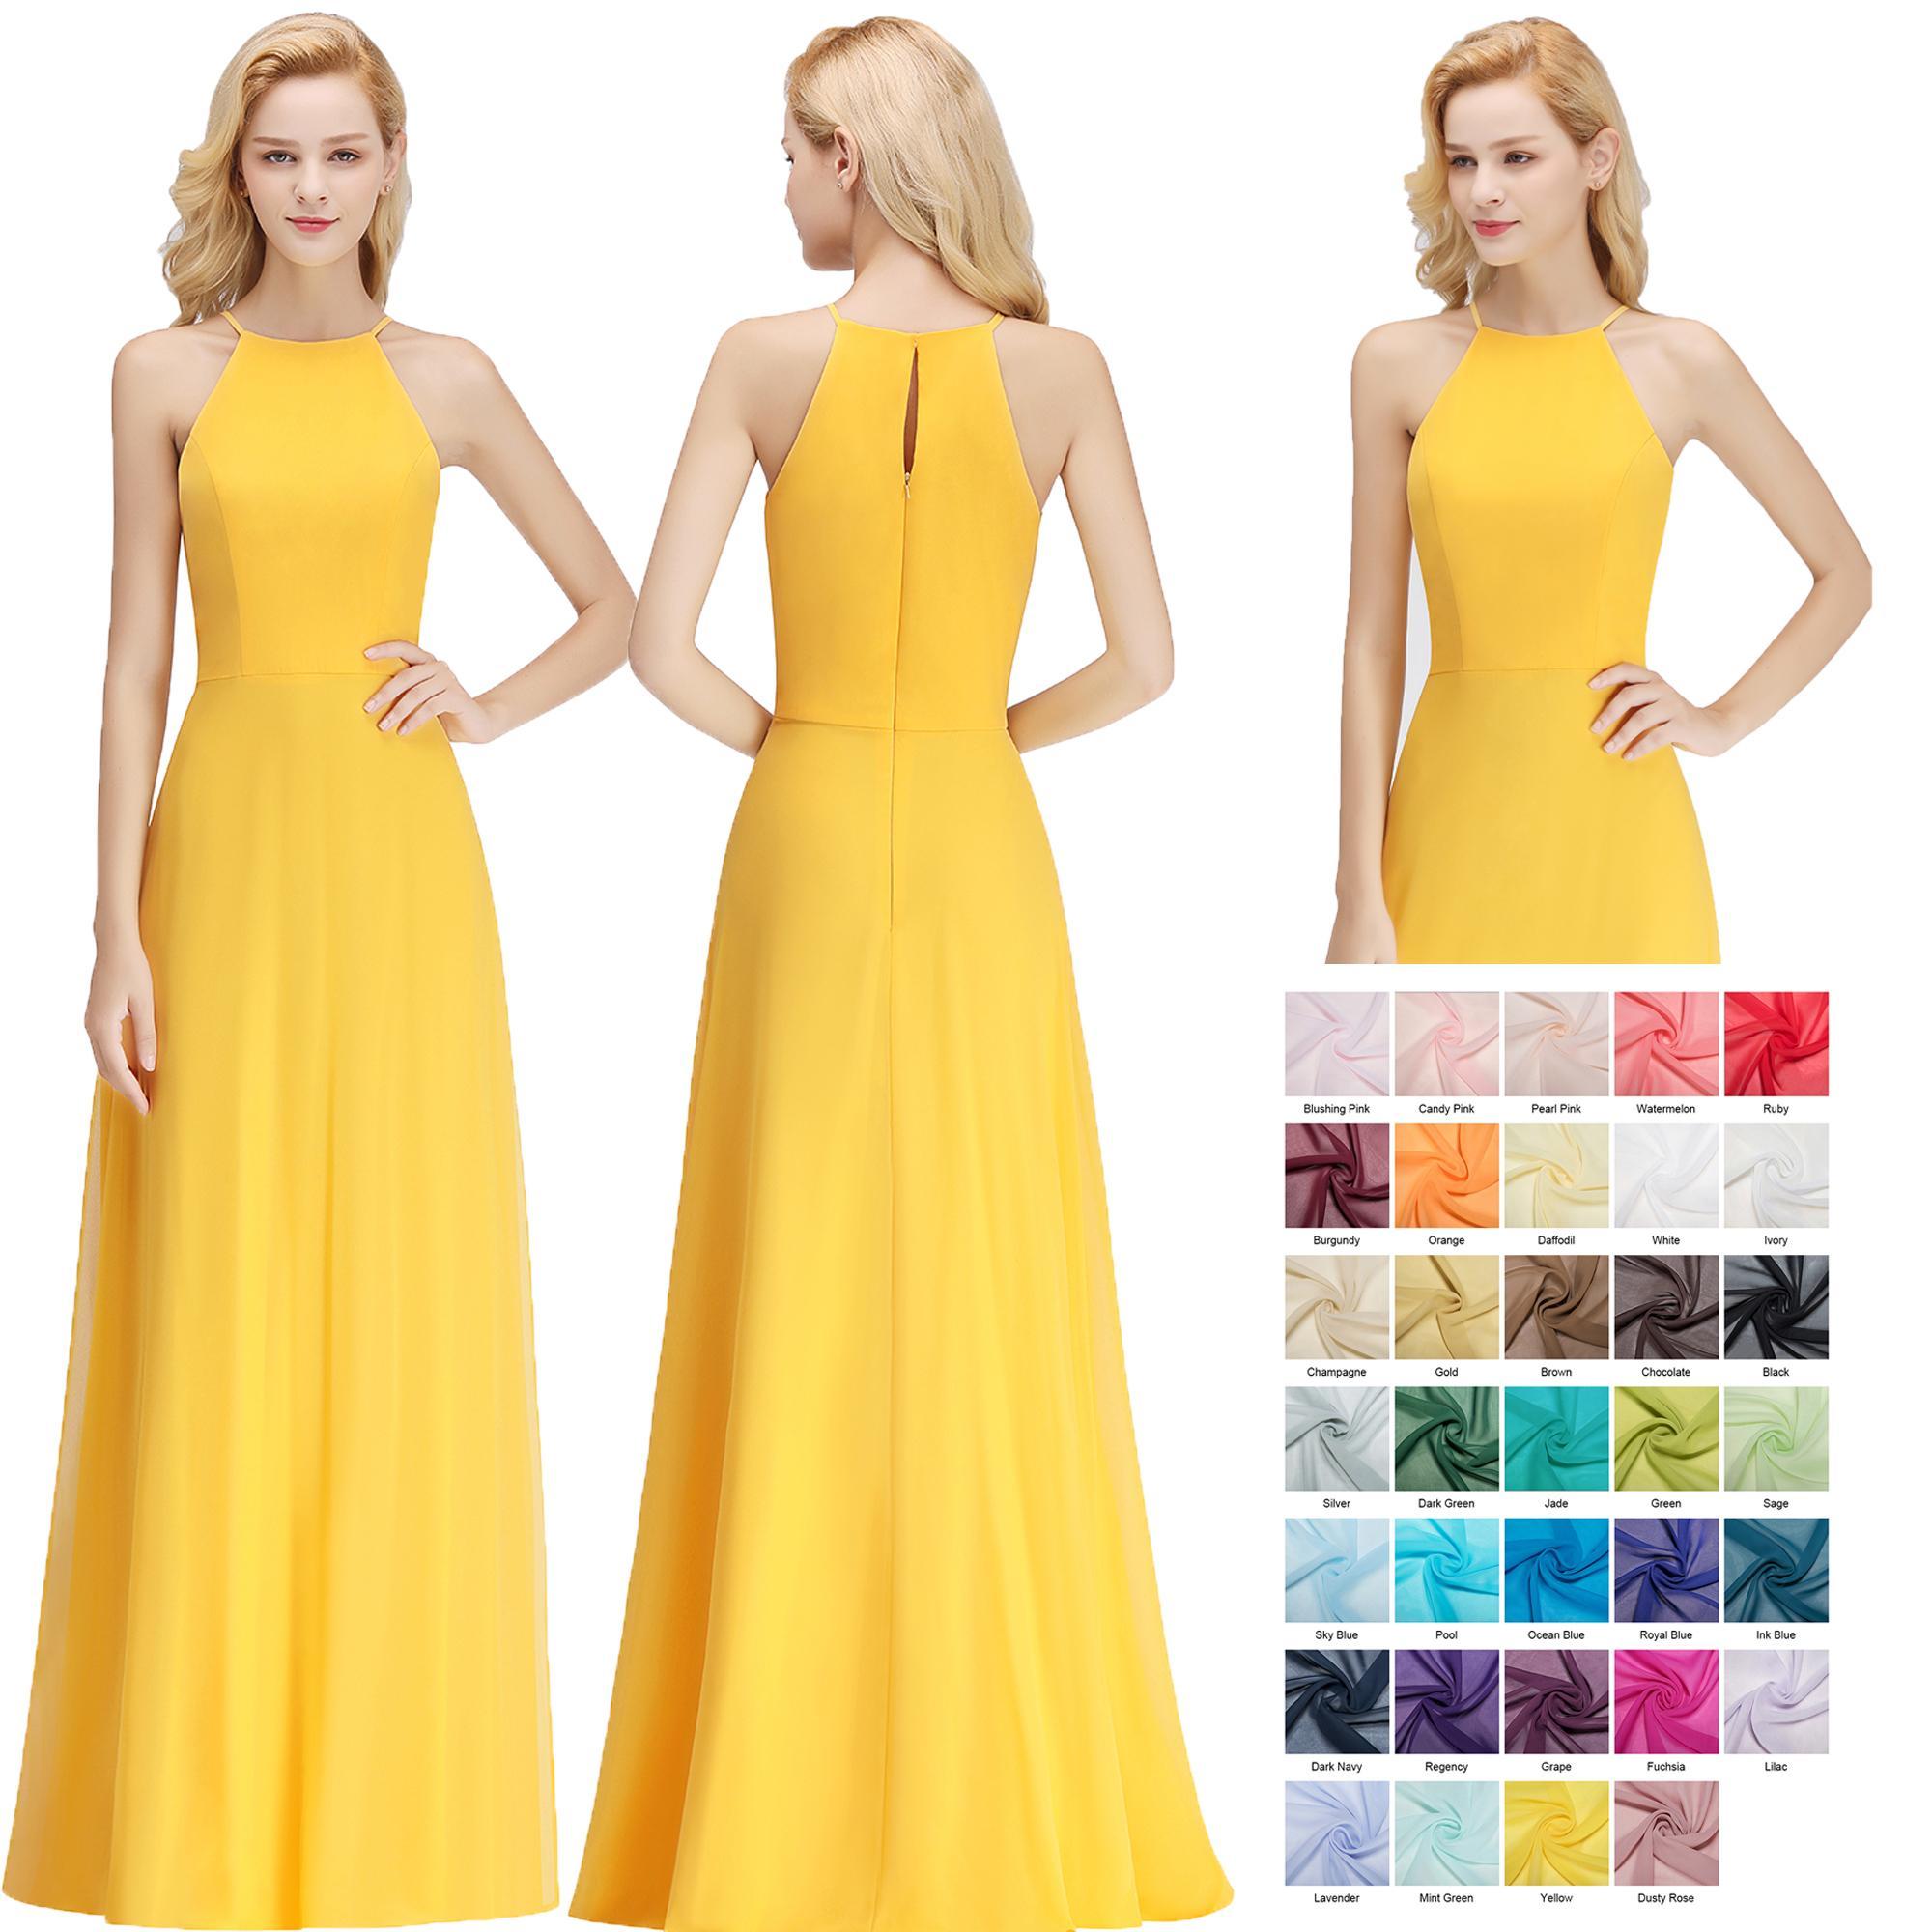 268bd57289 2018 Simple Cheap Yellow Bridesmaid Dresses Sexy Halter Chiffon Floor  Length Wedding Guest Dress Real Image BM0038 Yellow Bridesmaid Dresses Blue  ...